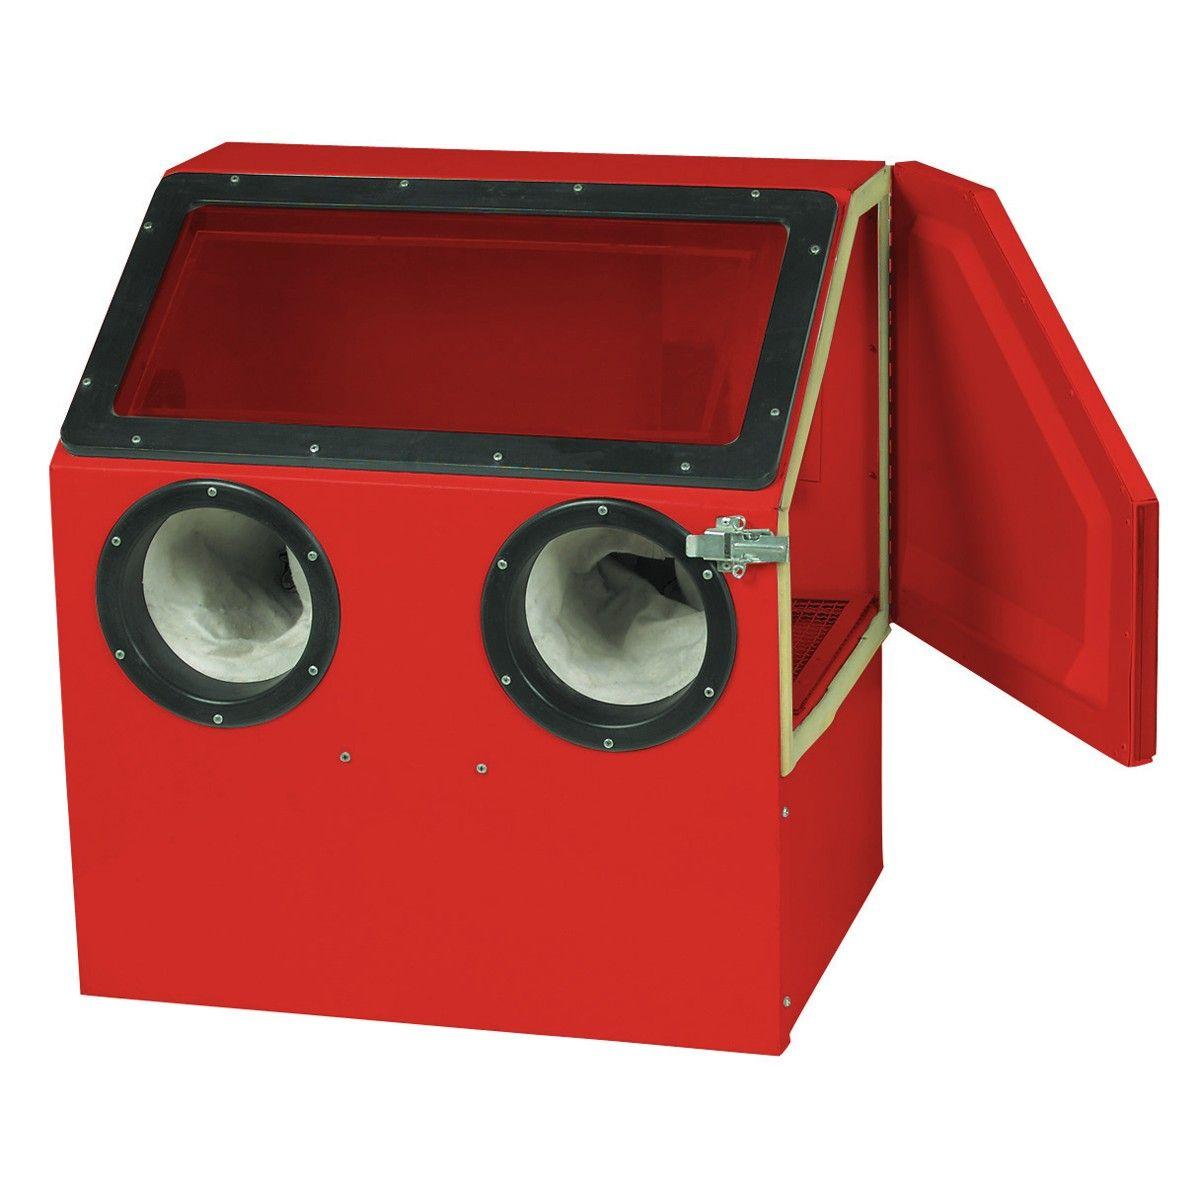 Central Pneumatic 42202 Abrasive Blast Cabinet  sc 1 st  Pinterest & Benchtop Blast Cabinet | FBG | Pinterest